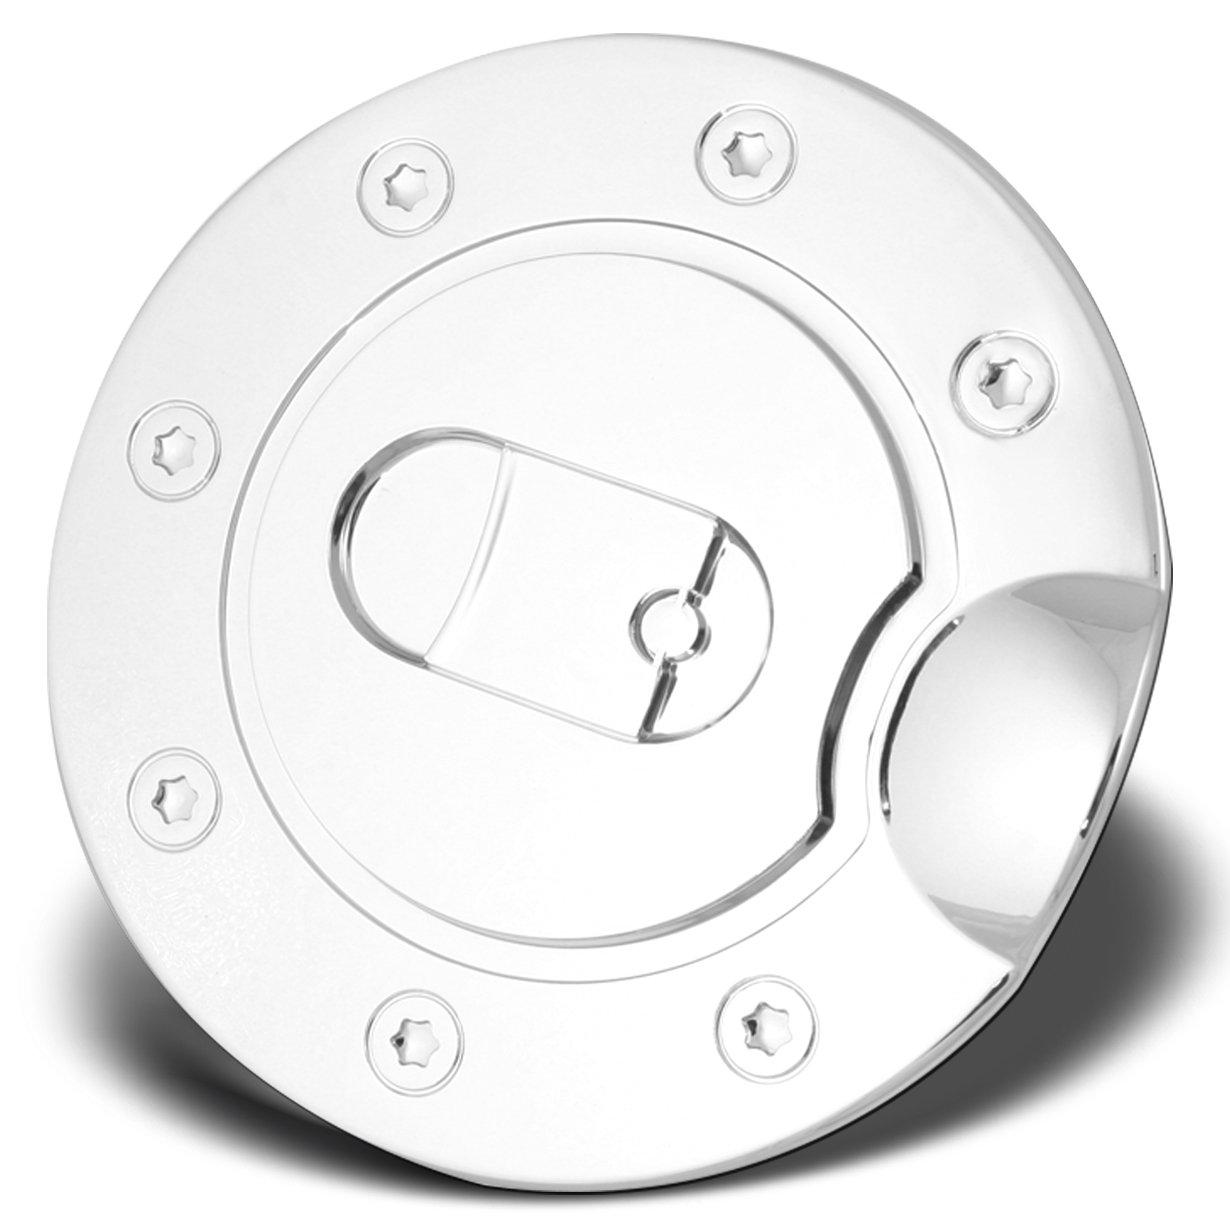 AutoModZone Chrome ABS Fuel Tank Gas Door Cap Cover for 09-17 Dodge Ram 1500 10-17 Dodge Ram 2500 3500